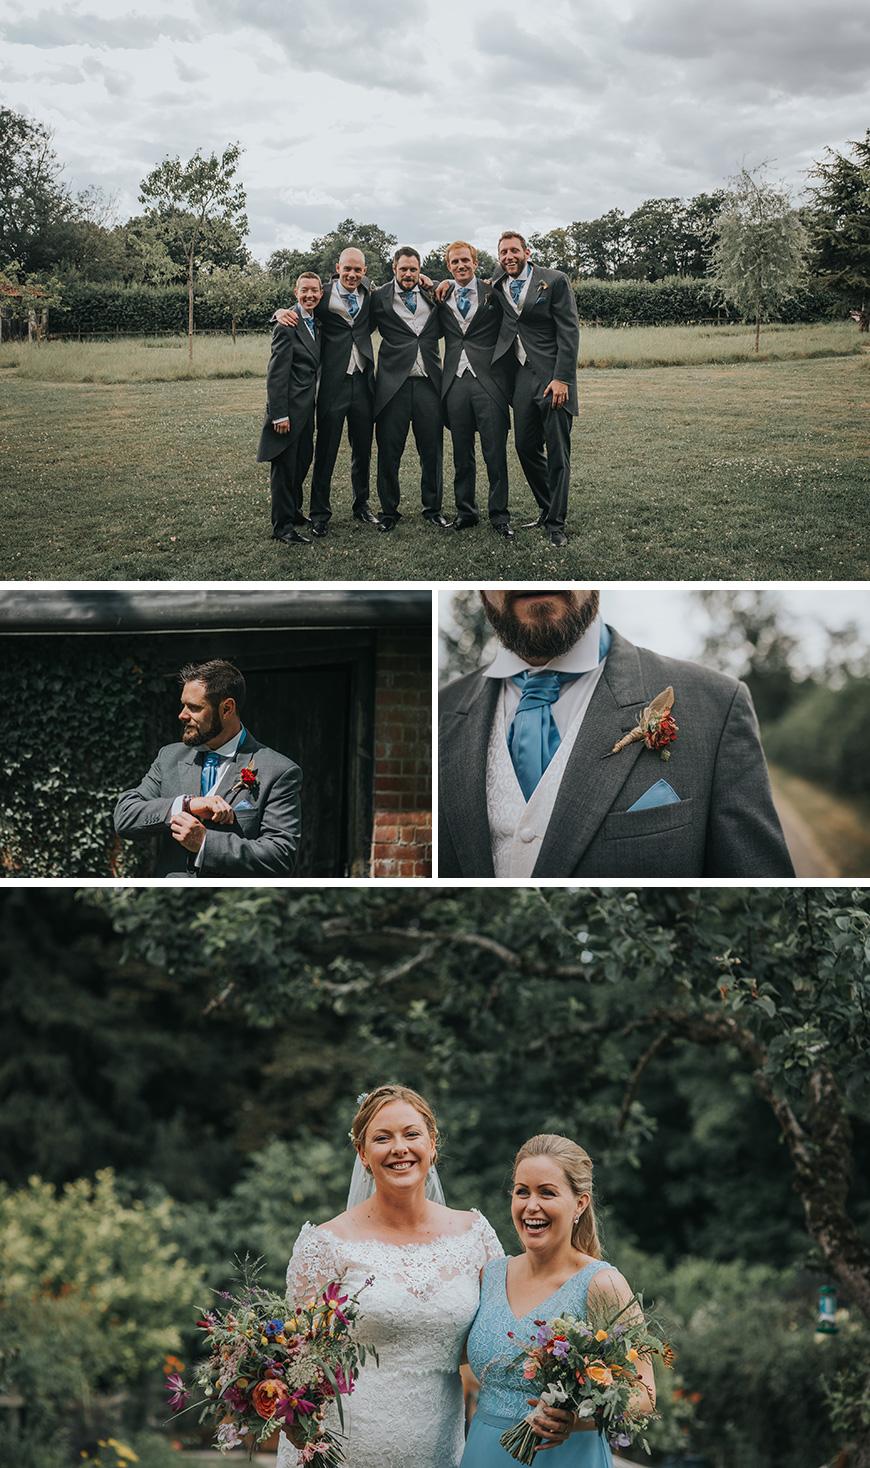 Real Wedding - Abi and David's Romantic Summer Wedding at Clock Barn | CHWV